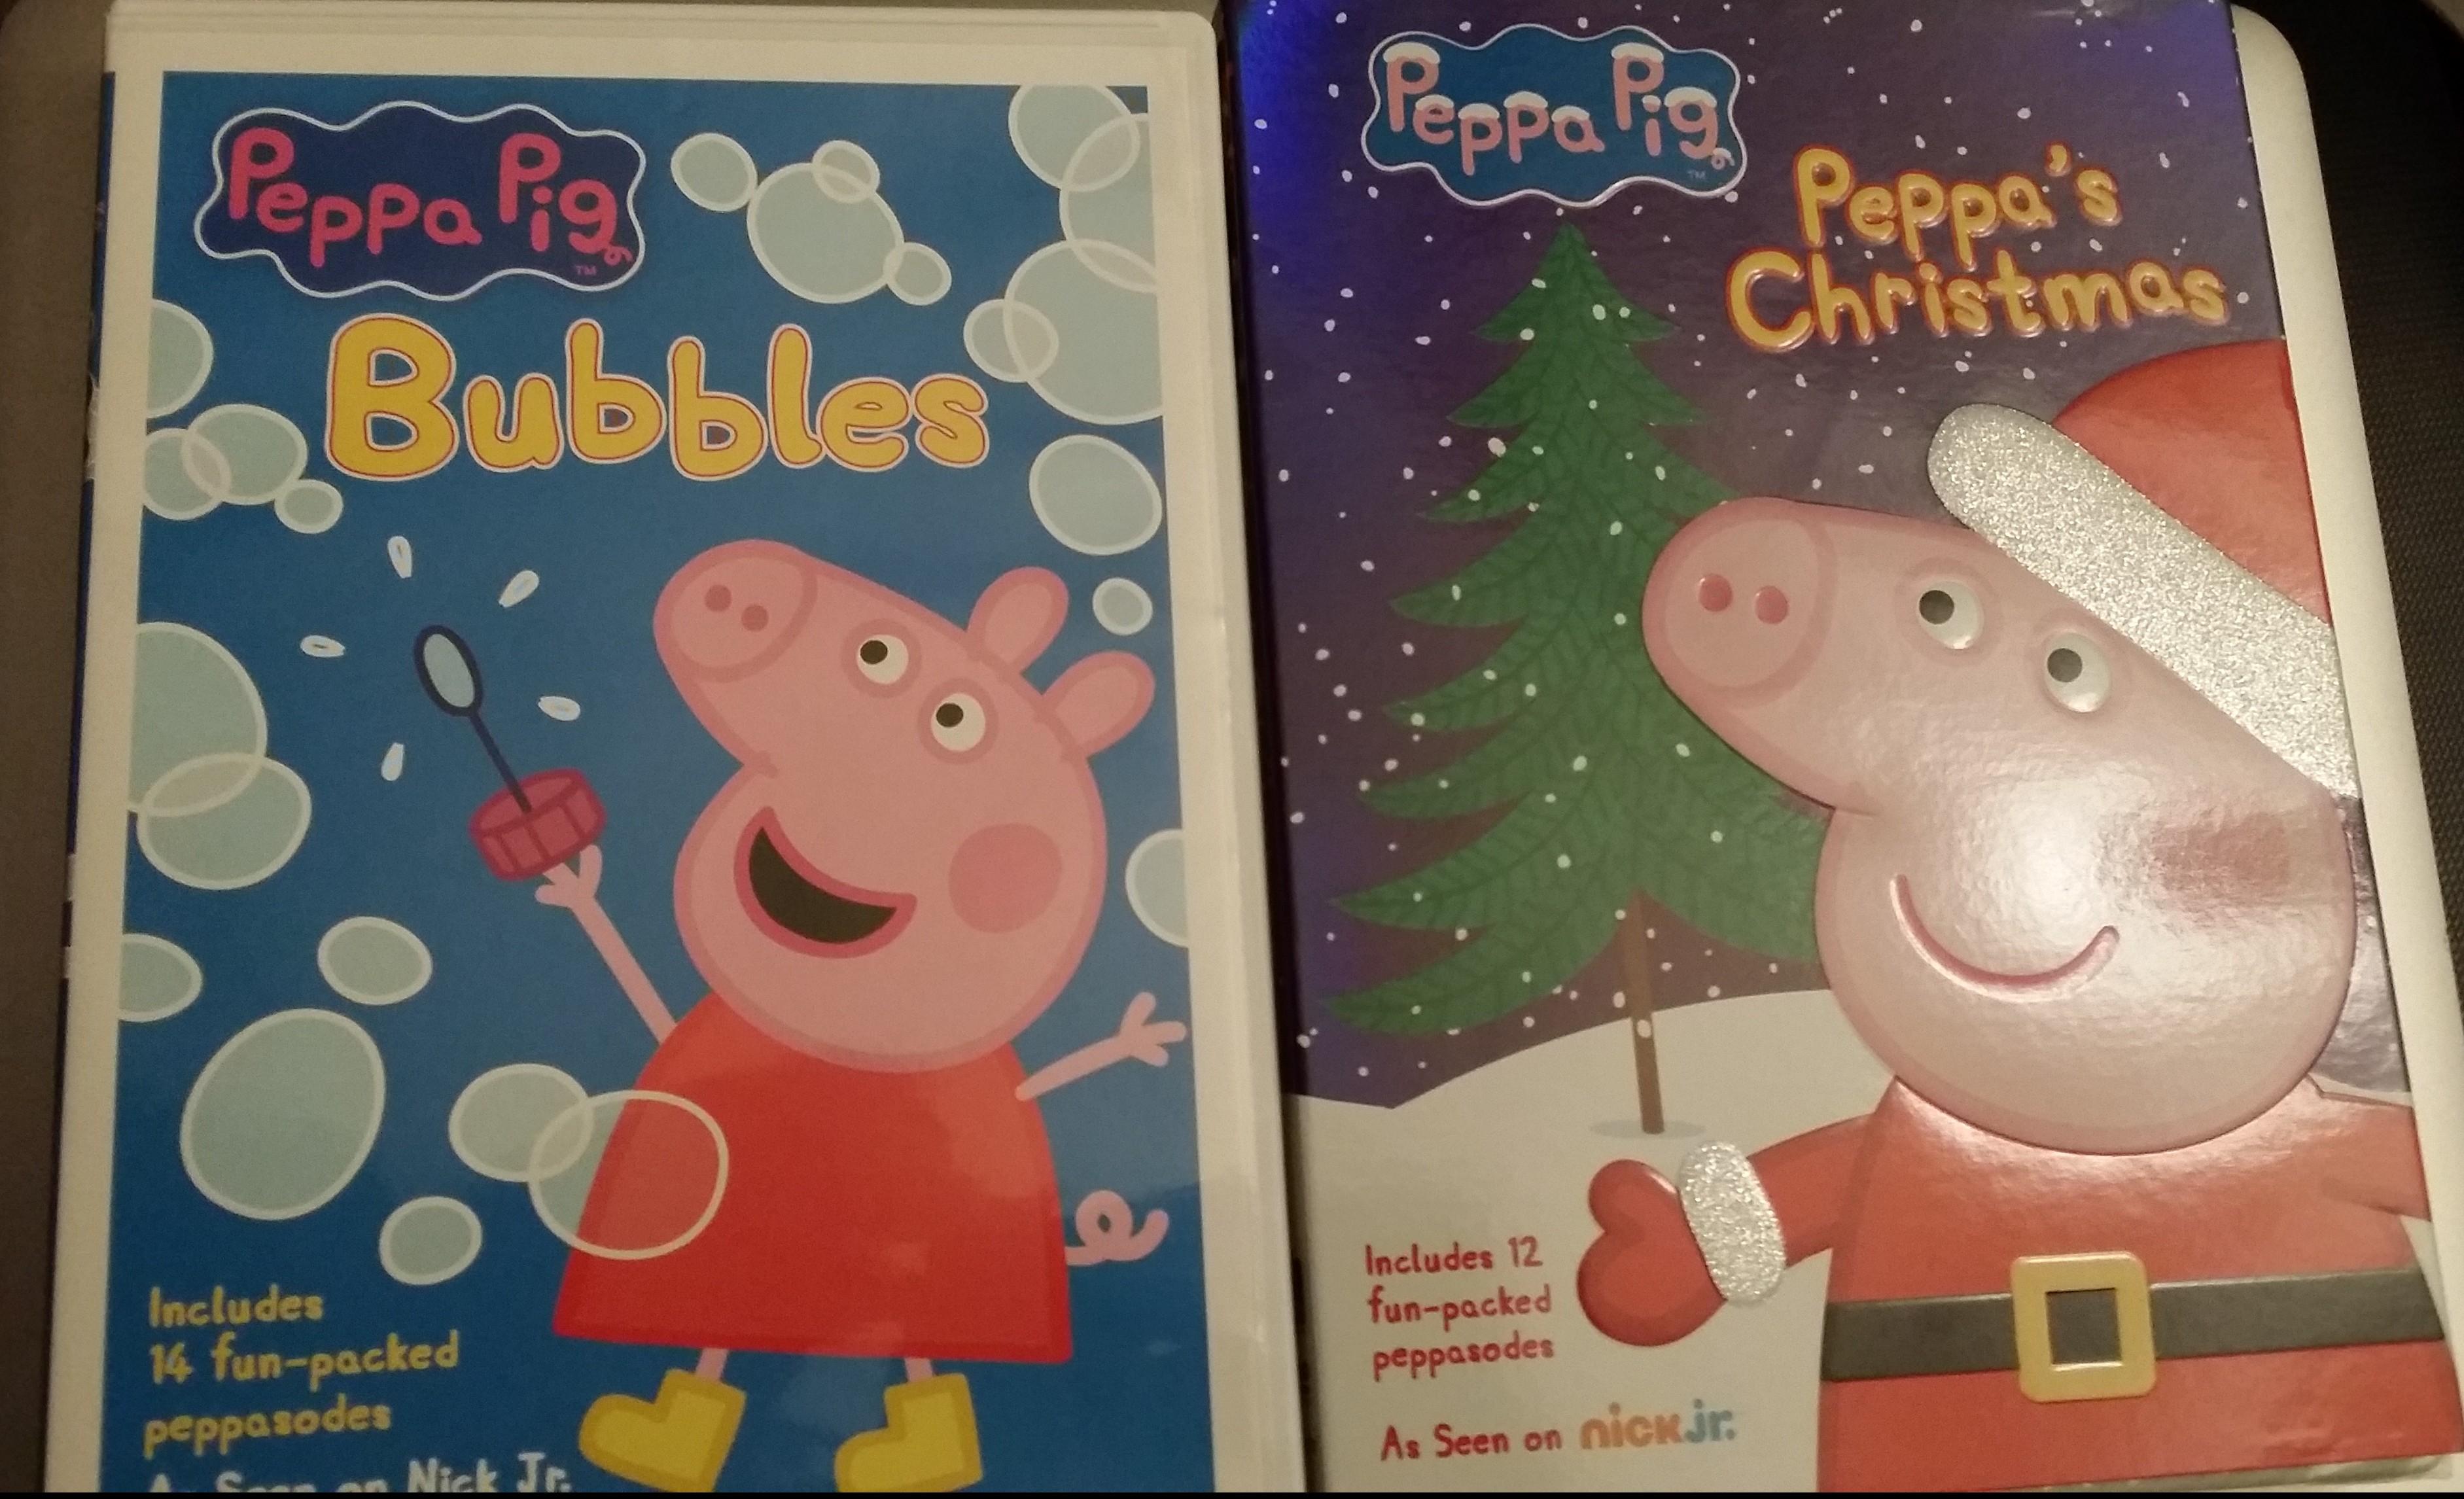 Peppa Pig - Peppas Christmas DVD